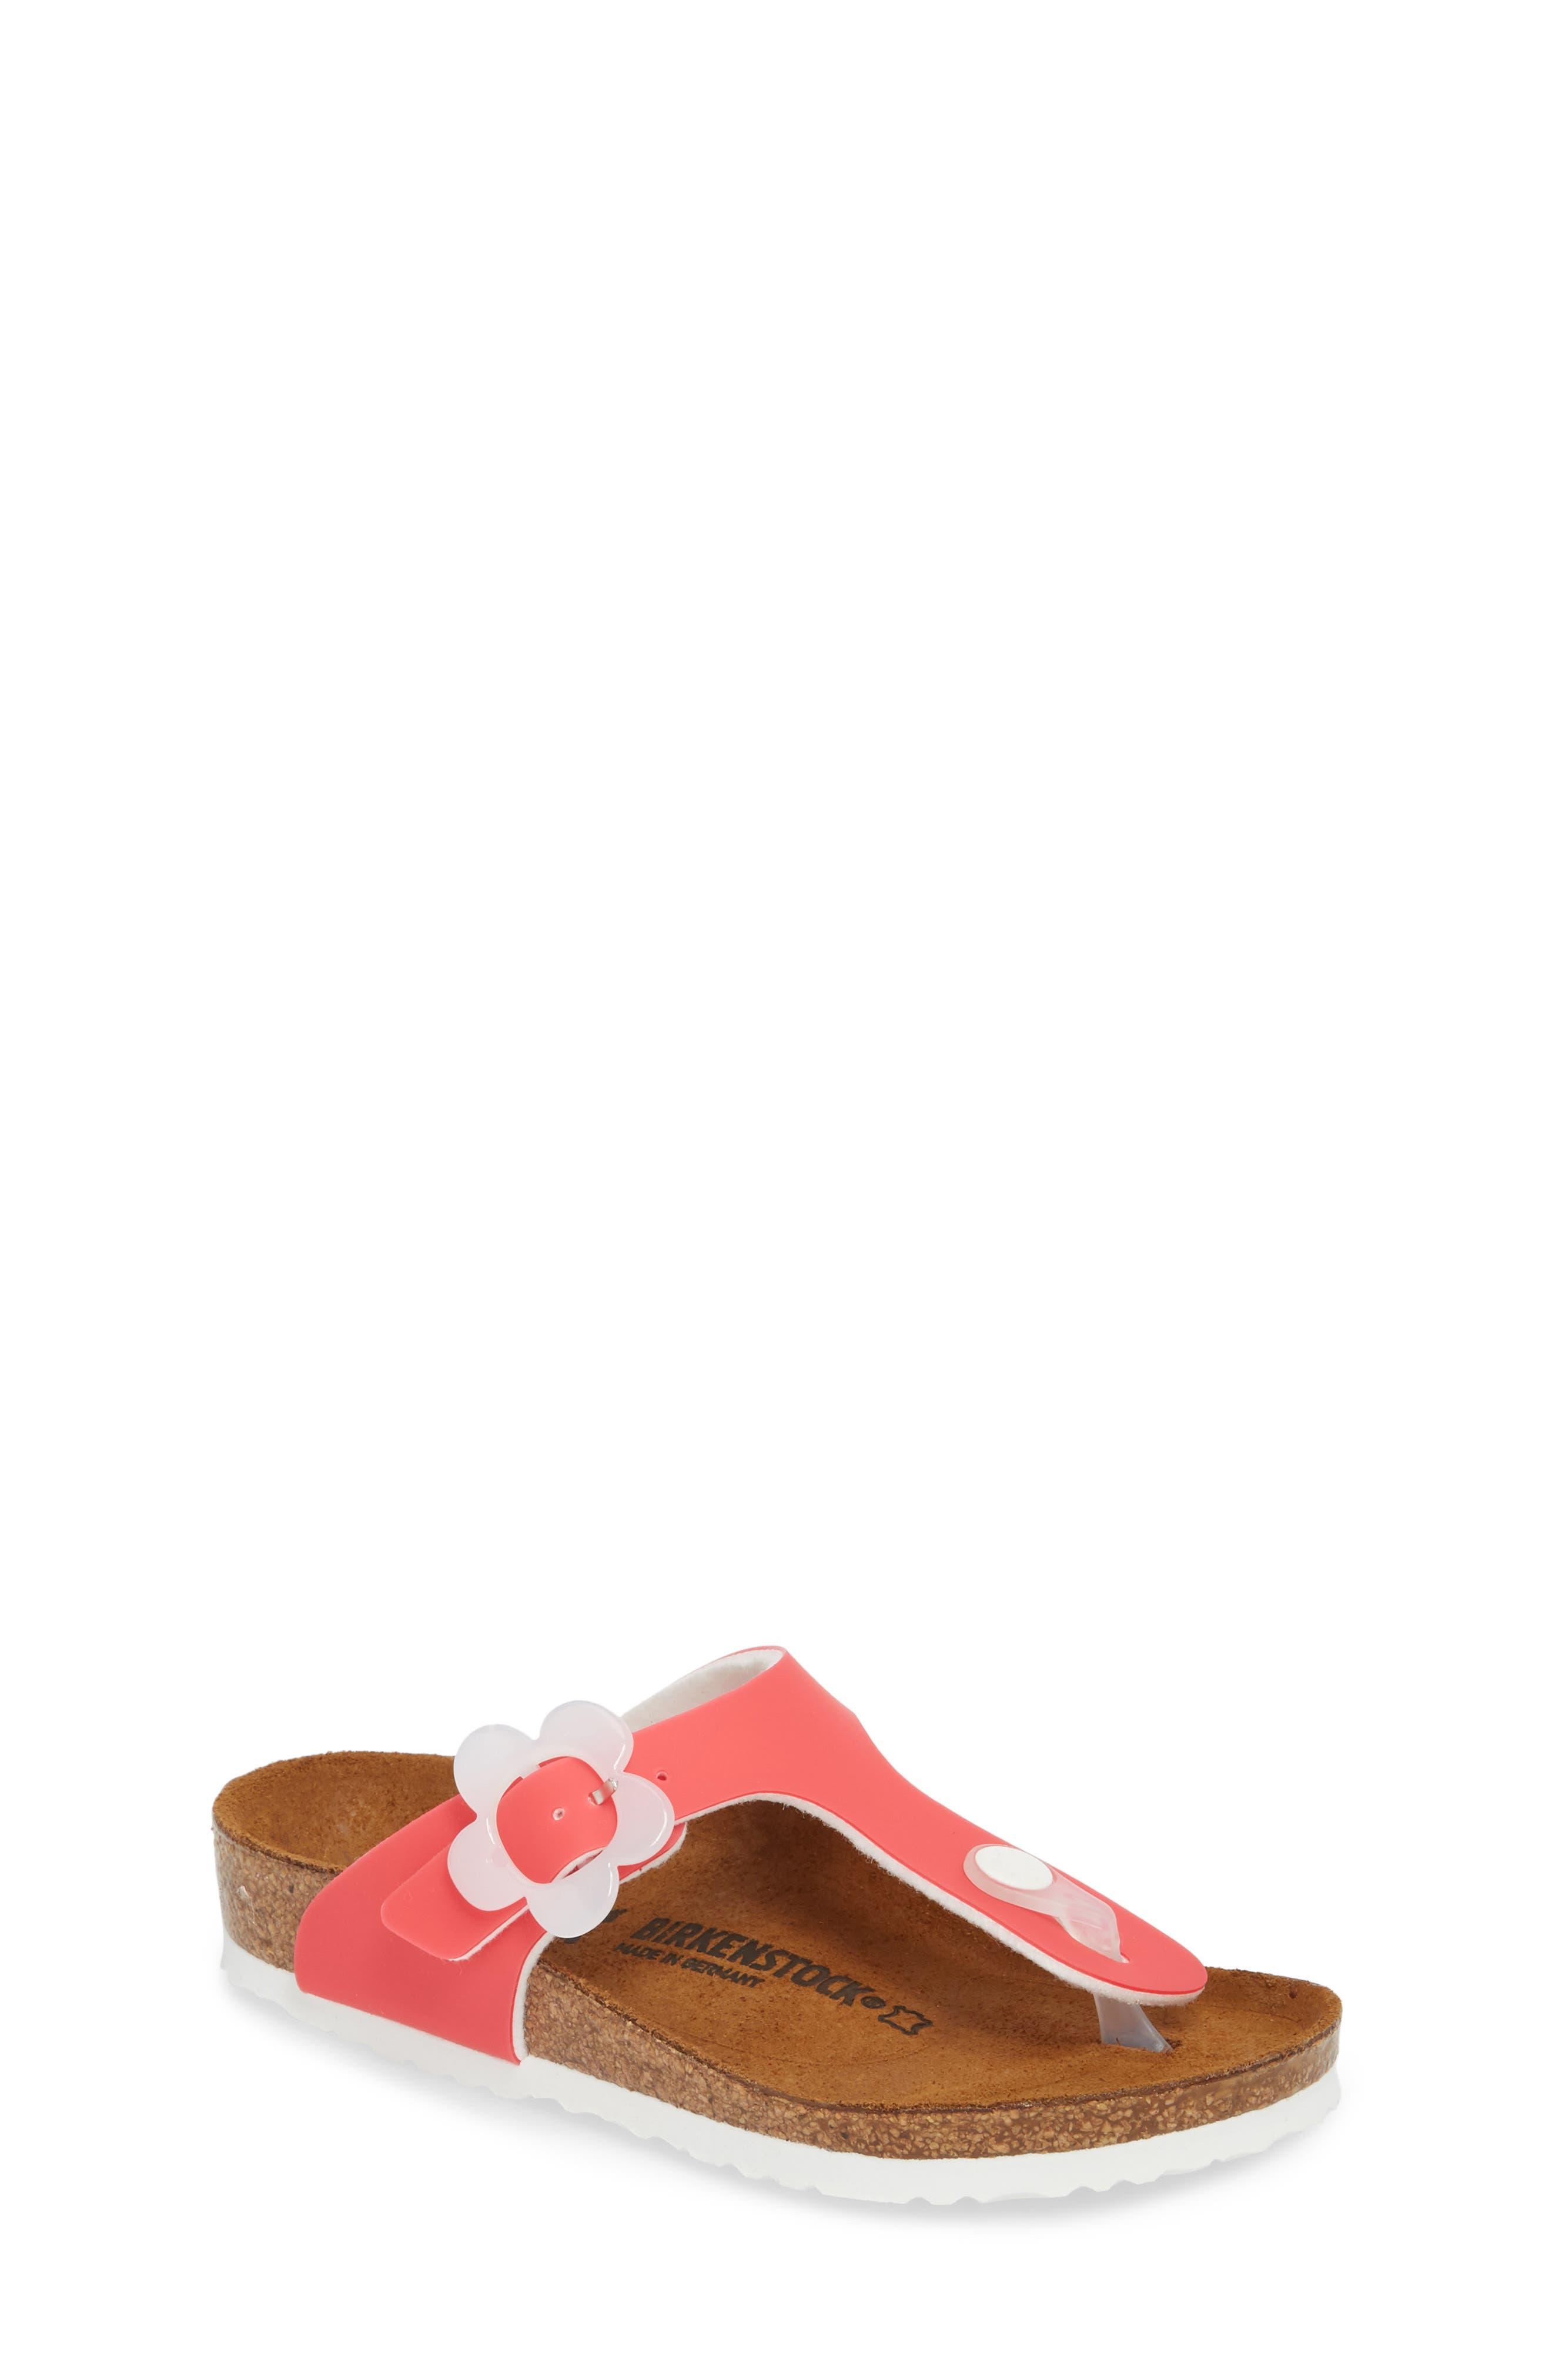 Gizeh Flowered Thong Sandal,                             Main thumbnail 1, color,                             650